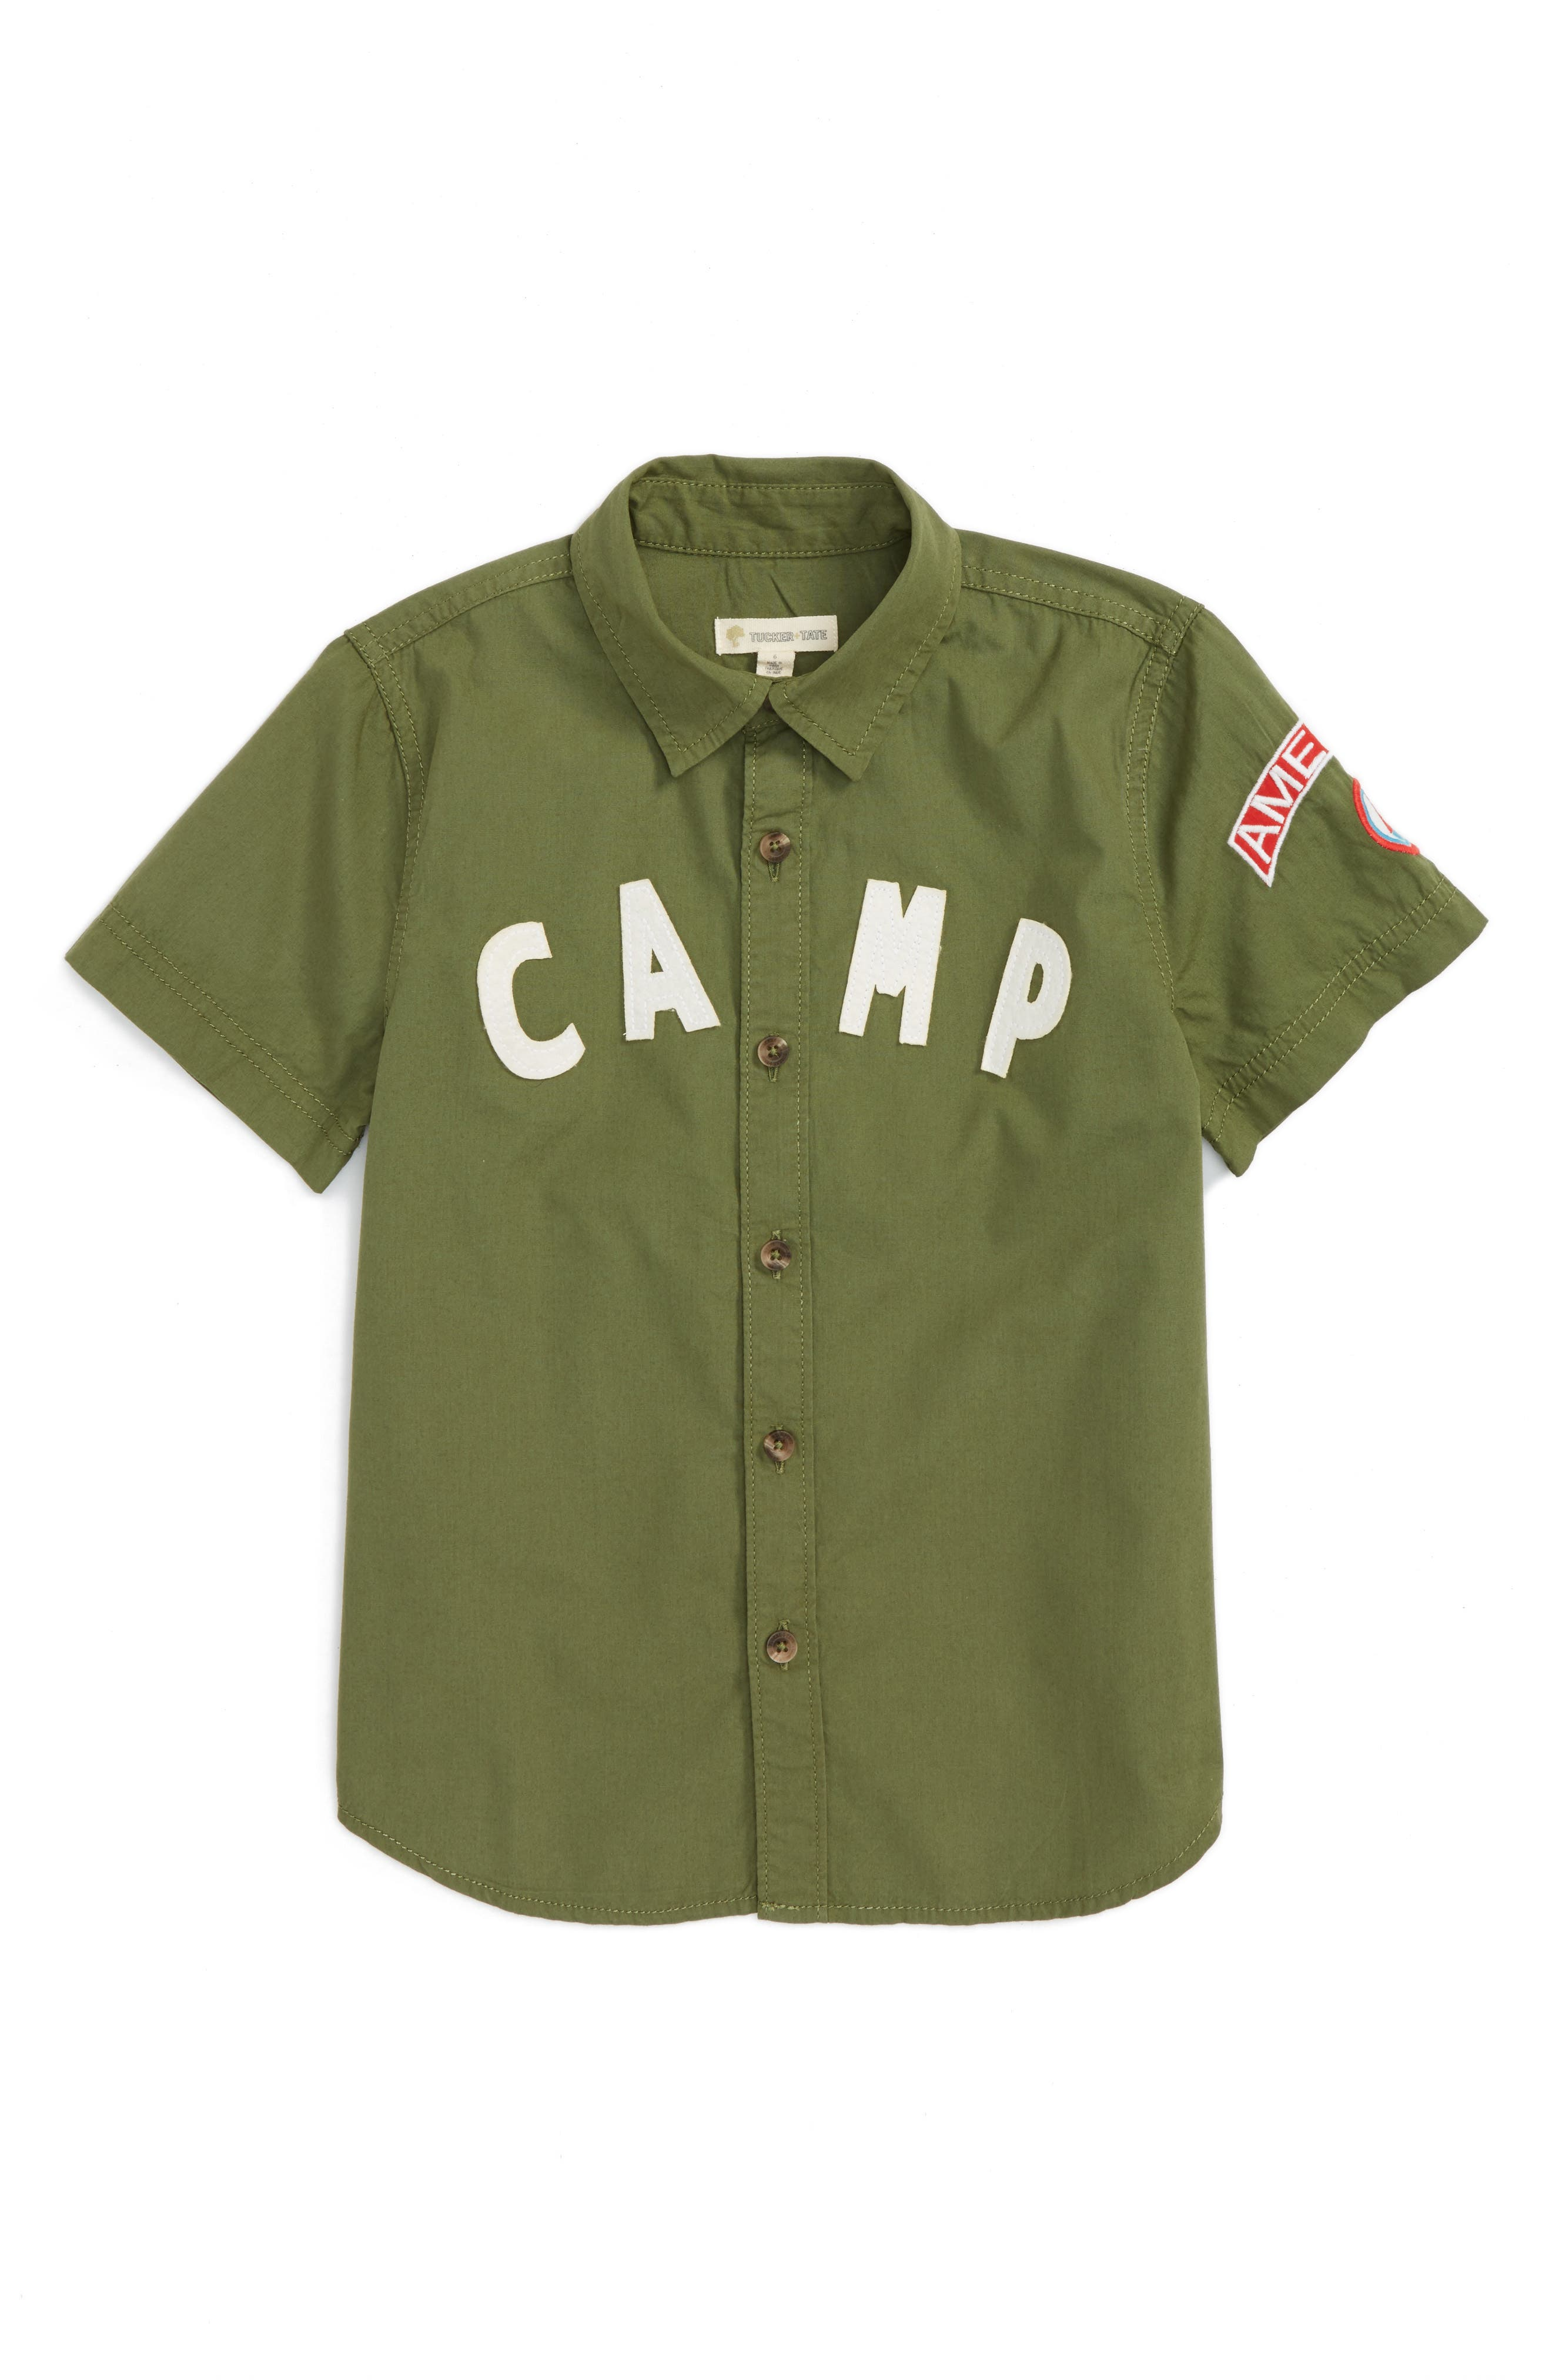 Camp Shirt,                         Main,                         color, Olive Sarma Camp